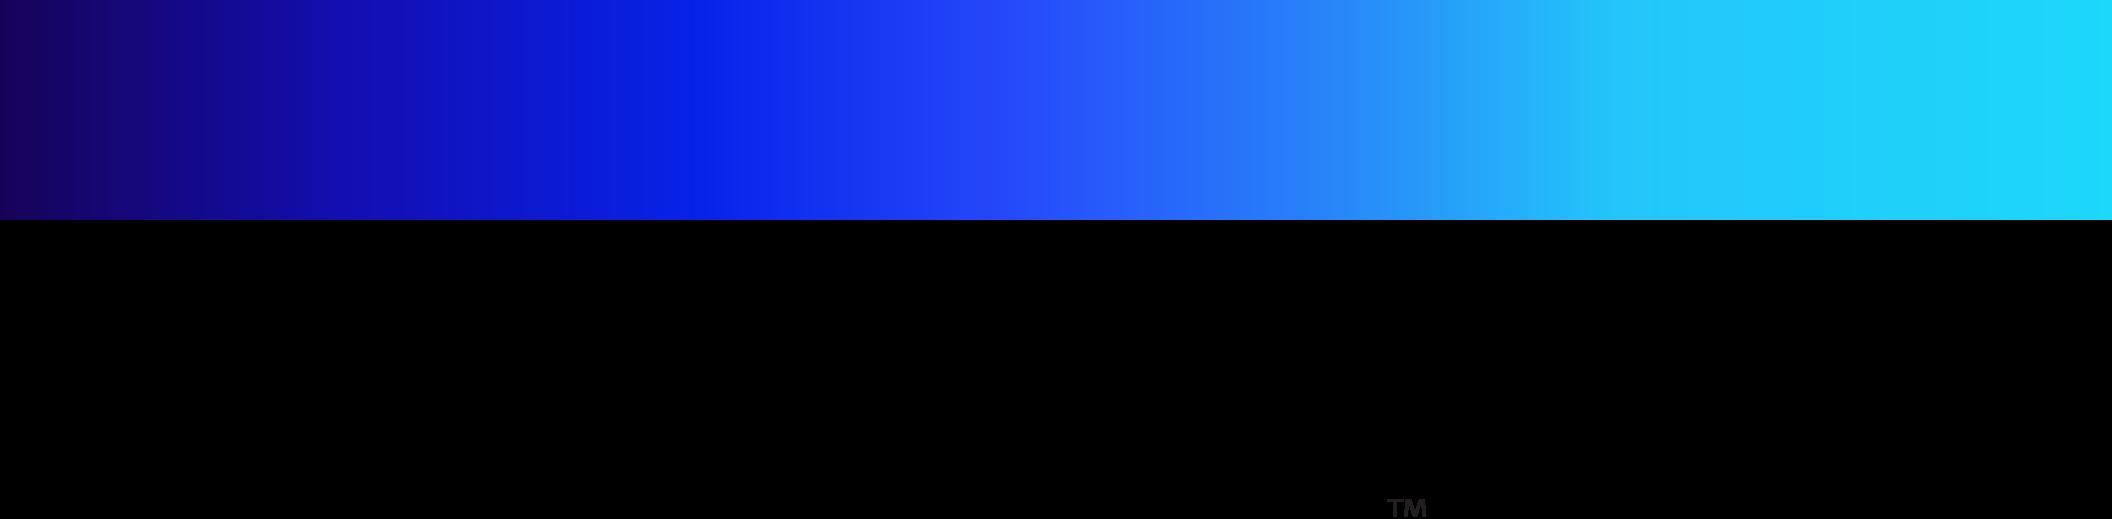 cloudblue_logo.png